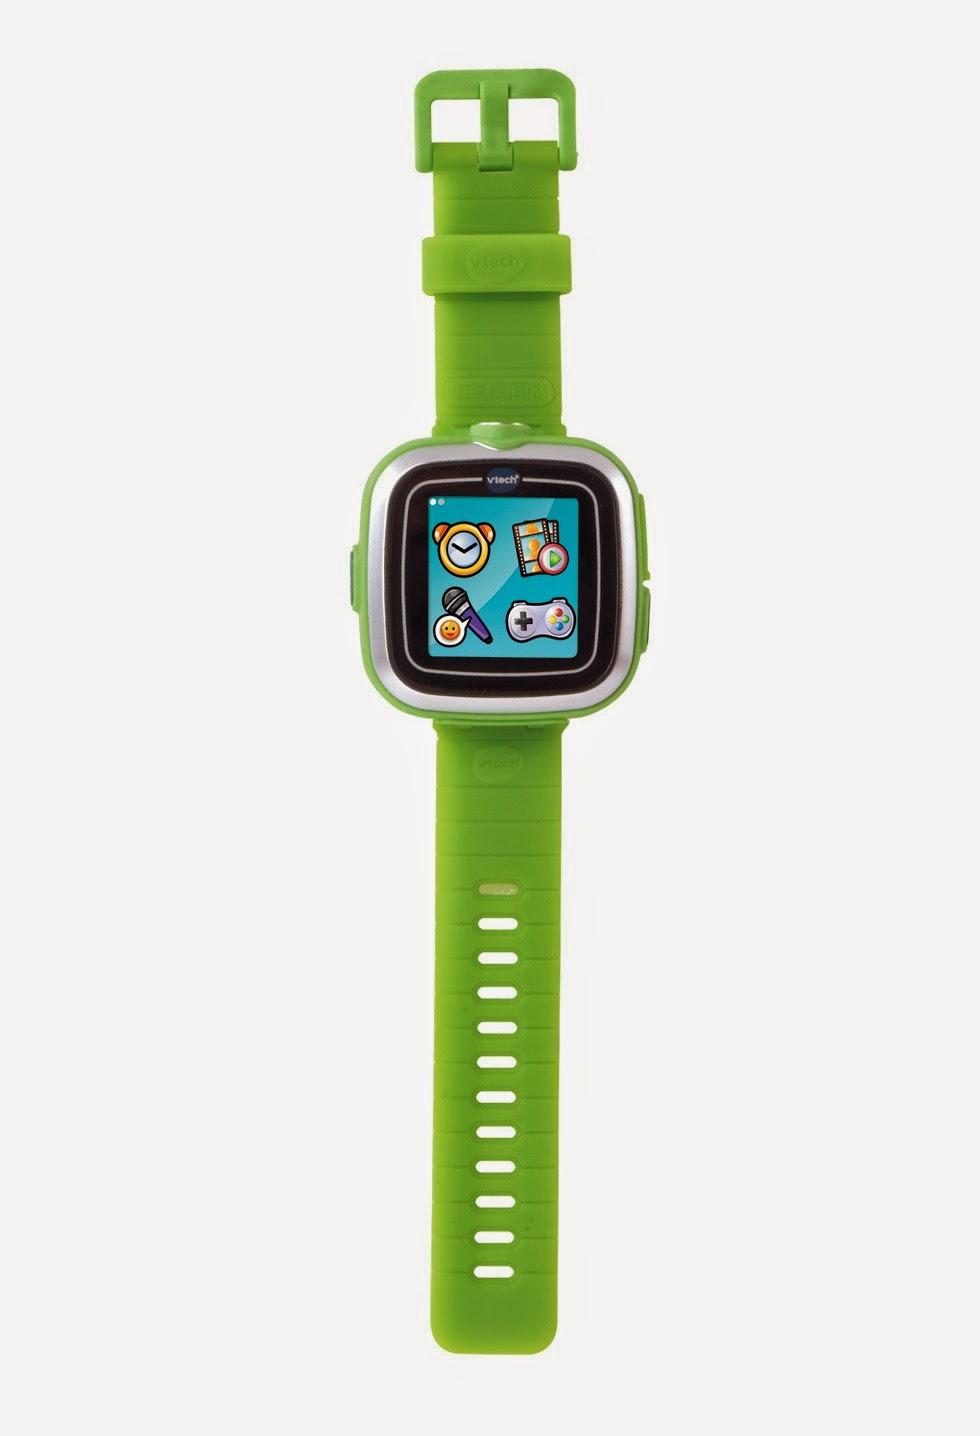 Kidizoom Smartwatch giveaway